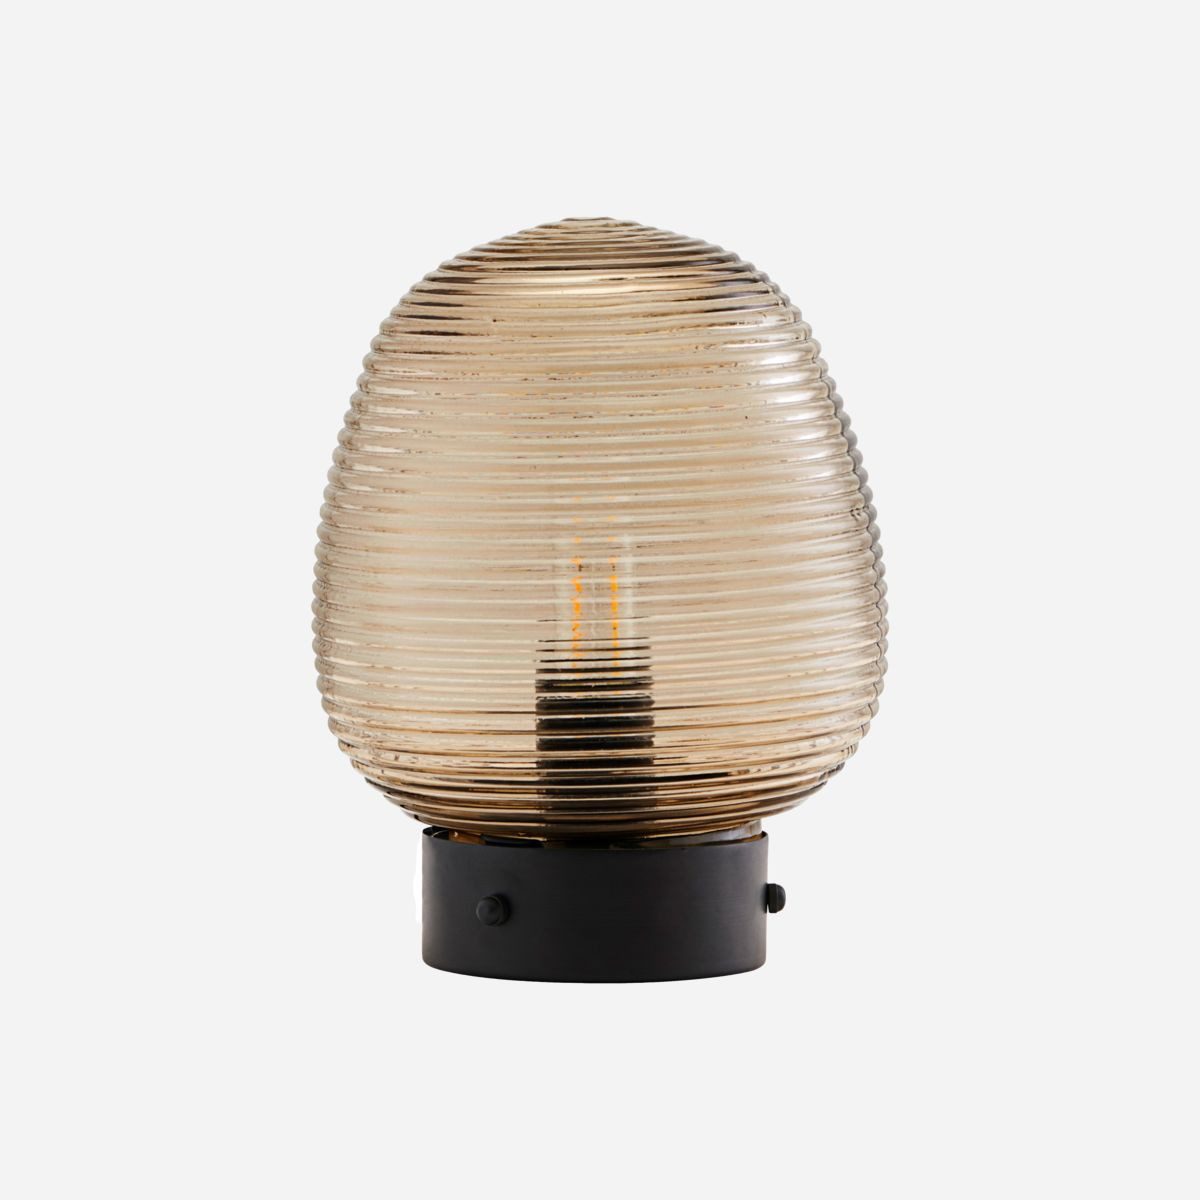 Tischlampe Ghia | Braun